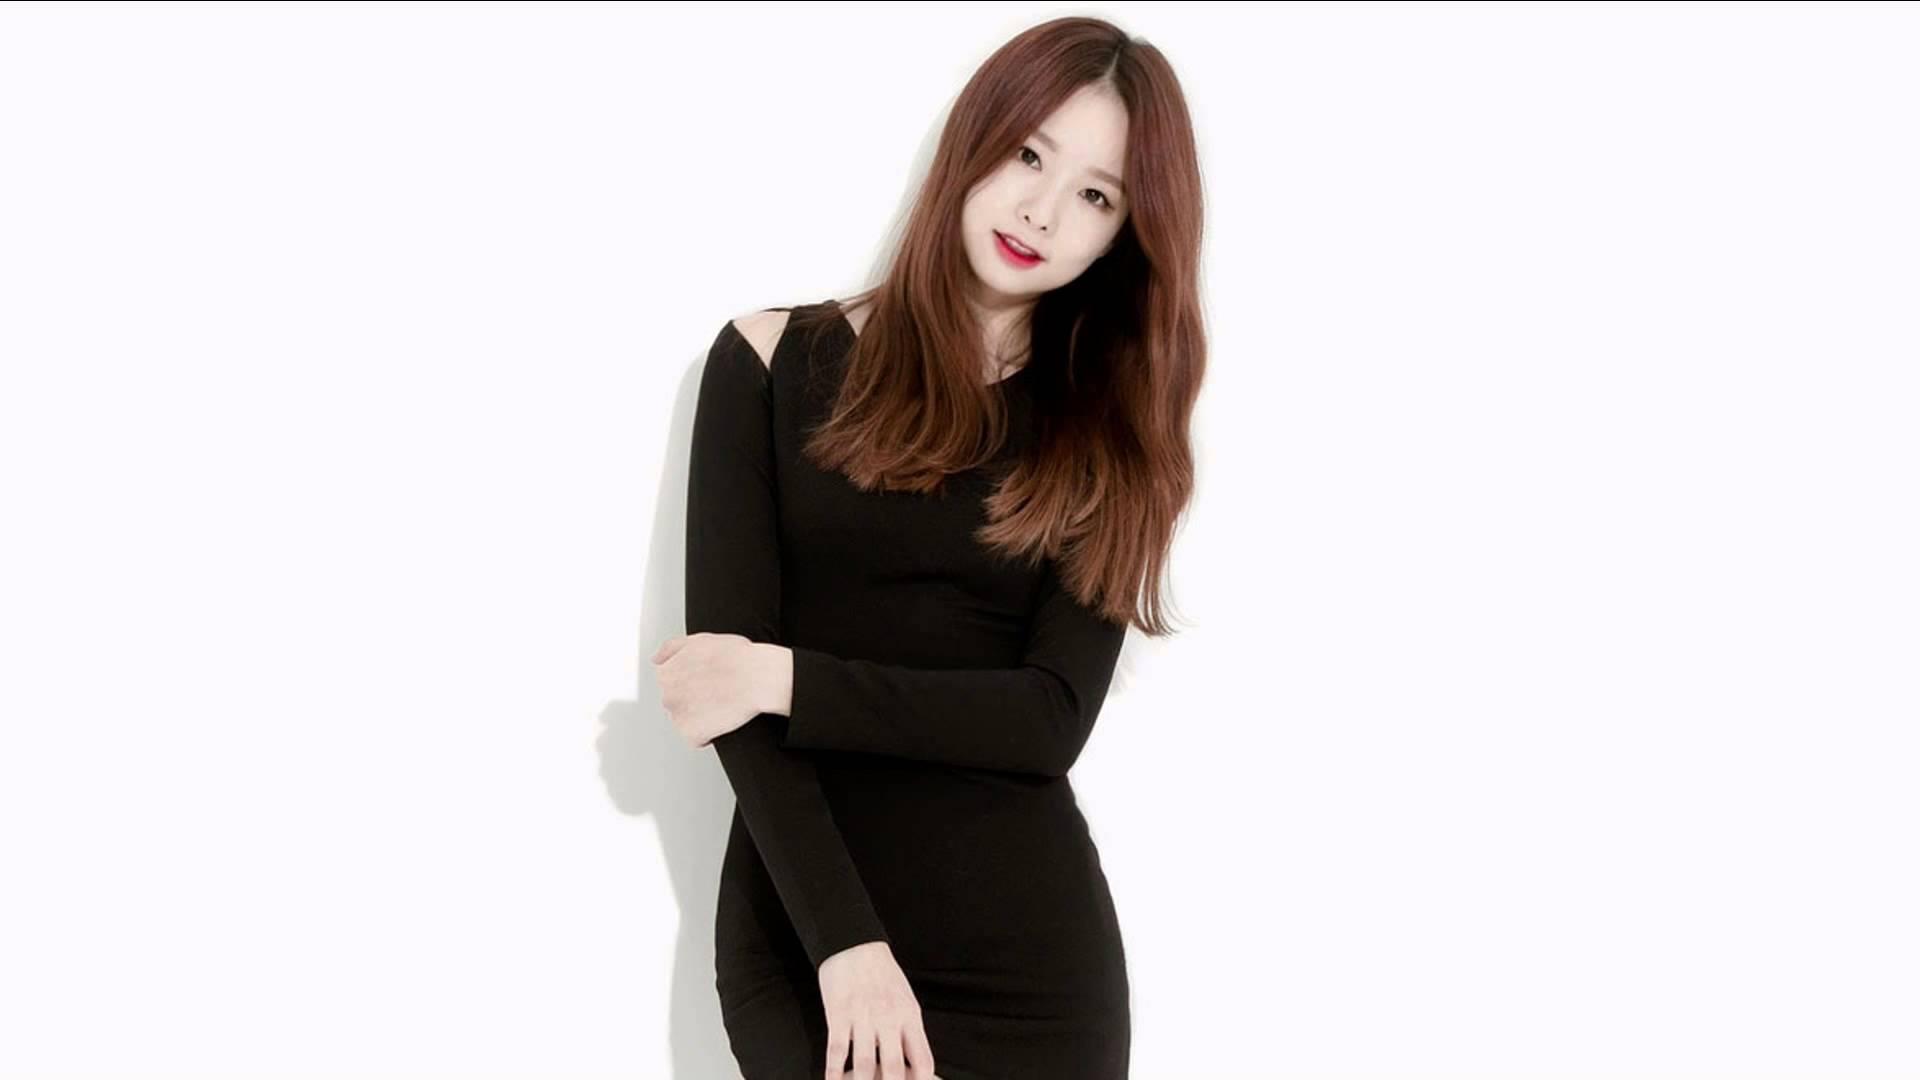 taehyung wallpaper hd